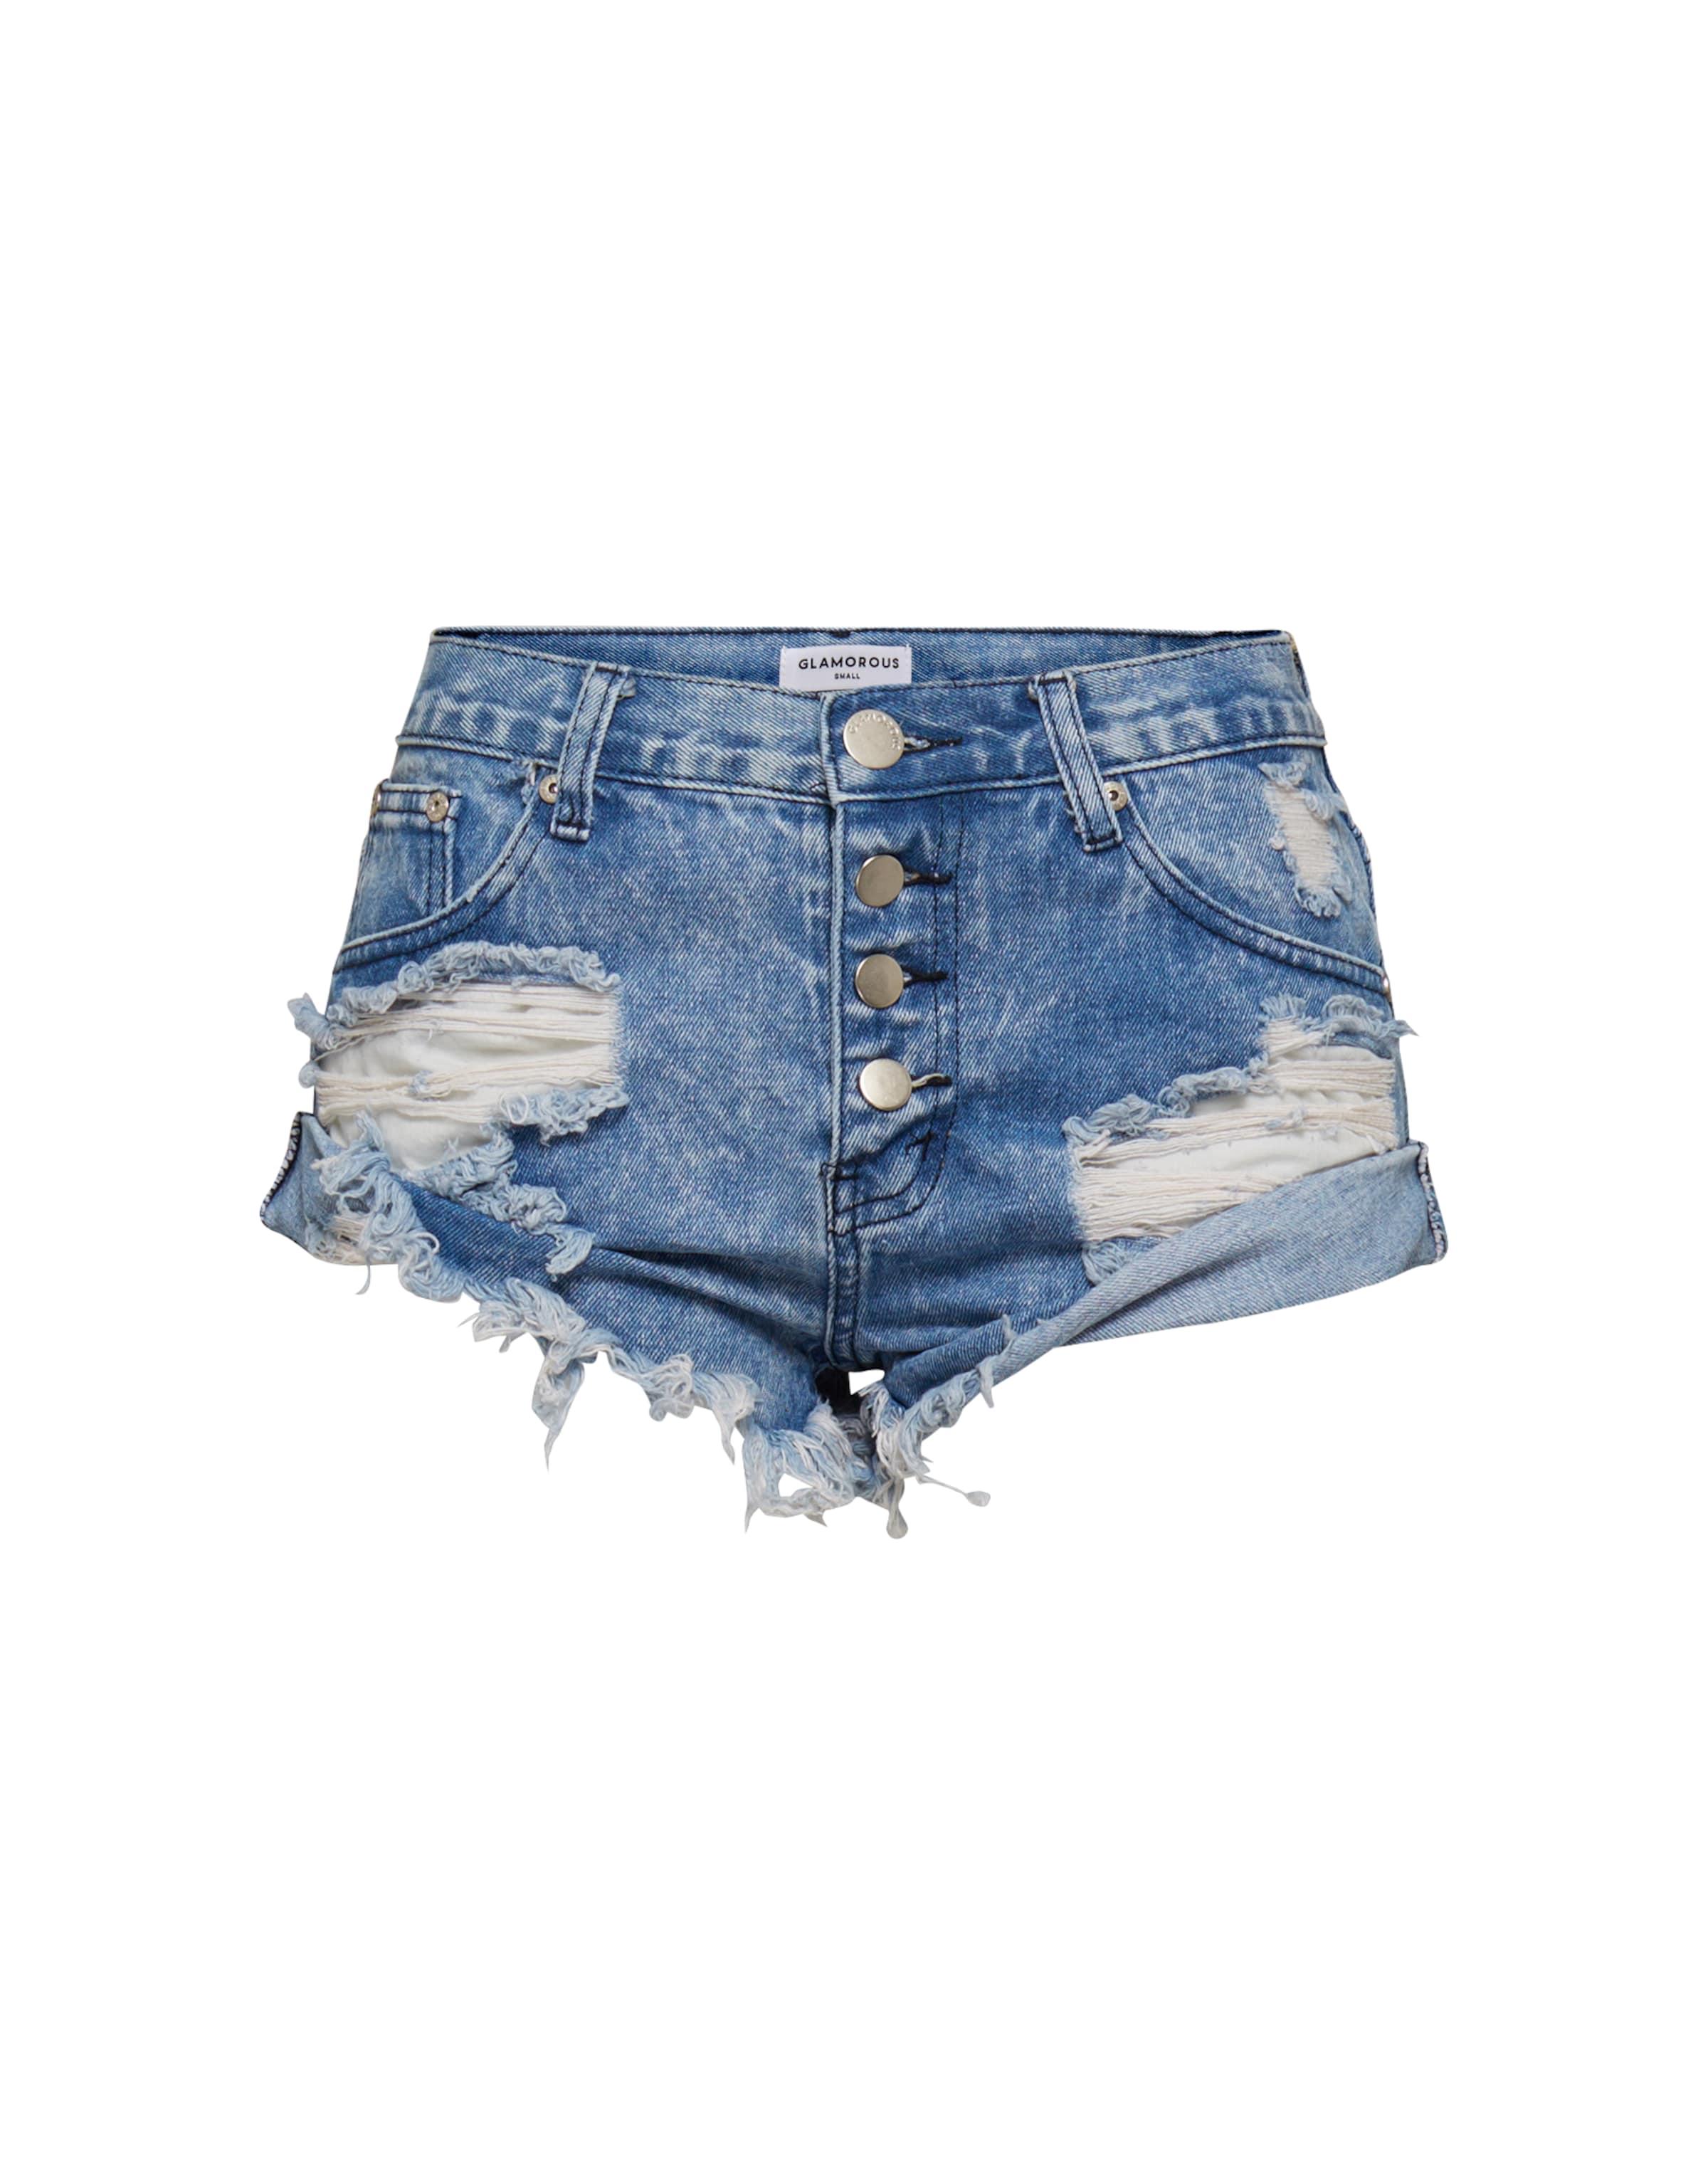 'ka4527' Shorts In 'ka4527' Glamorous Glamorous Blau Blau Shorts Glamorous In UqpSzMV